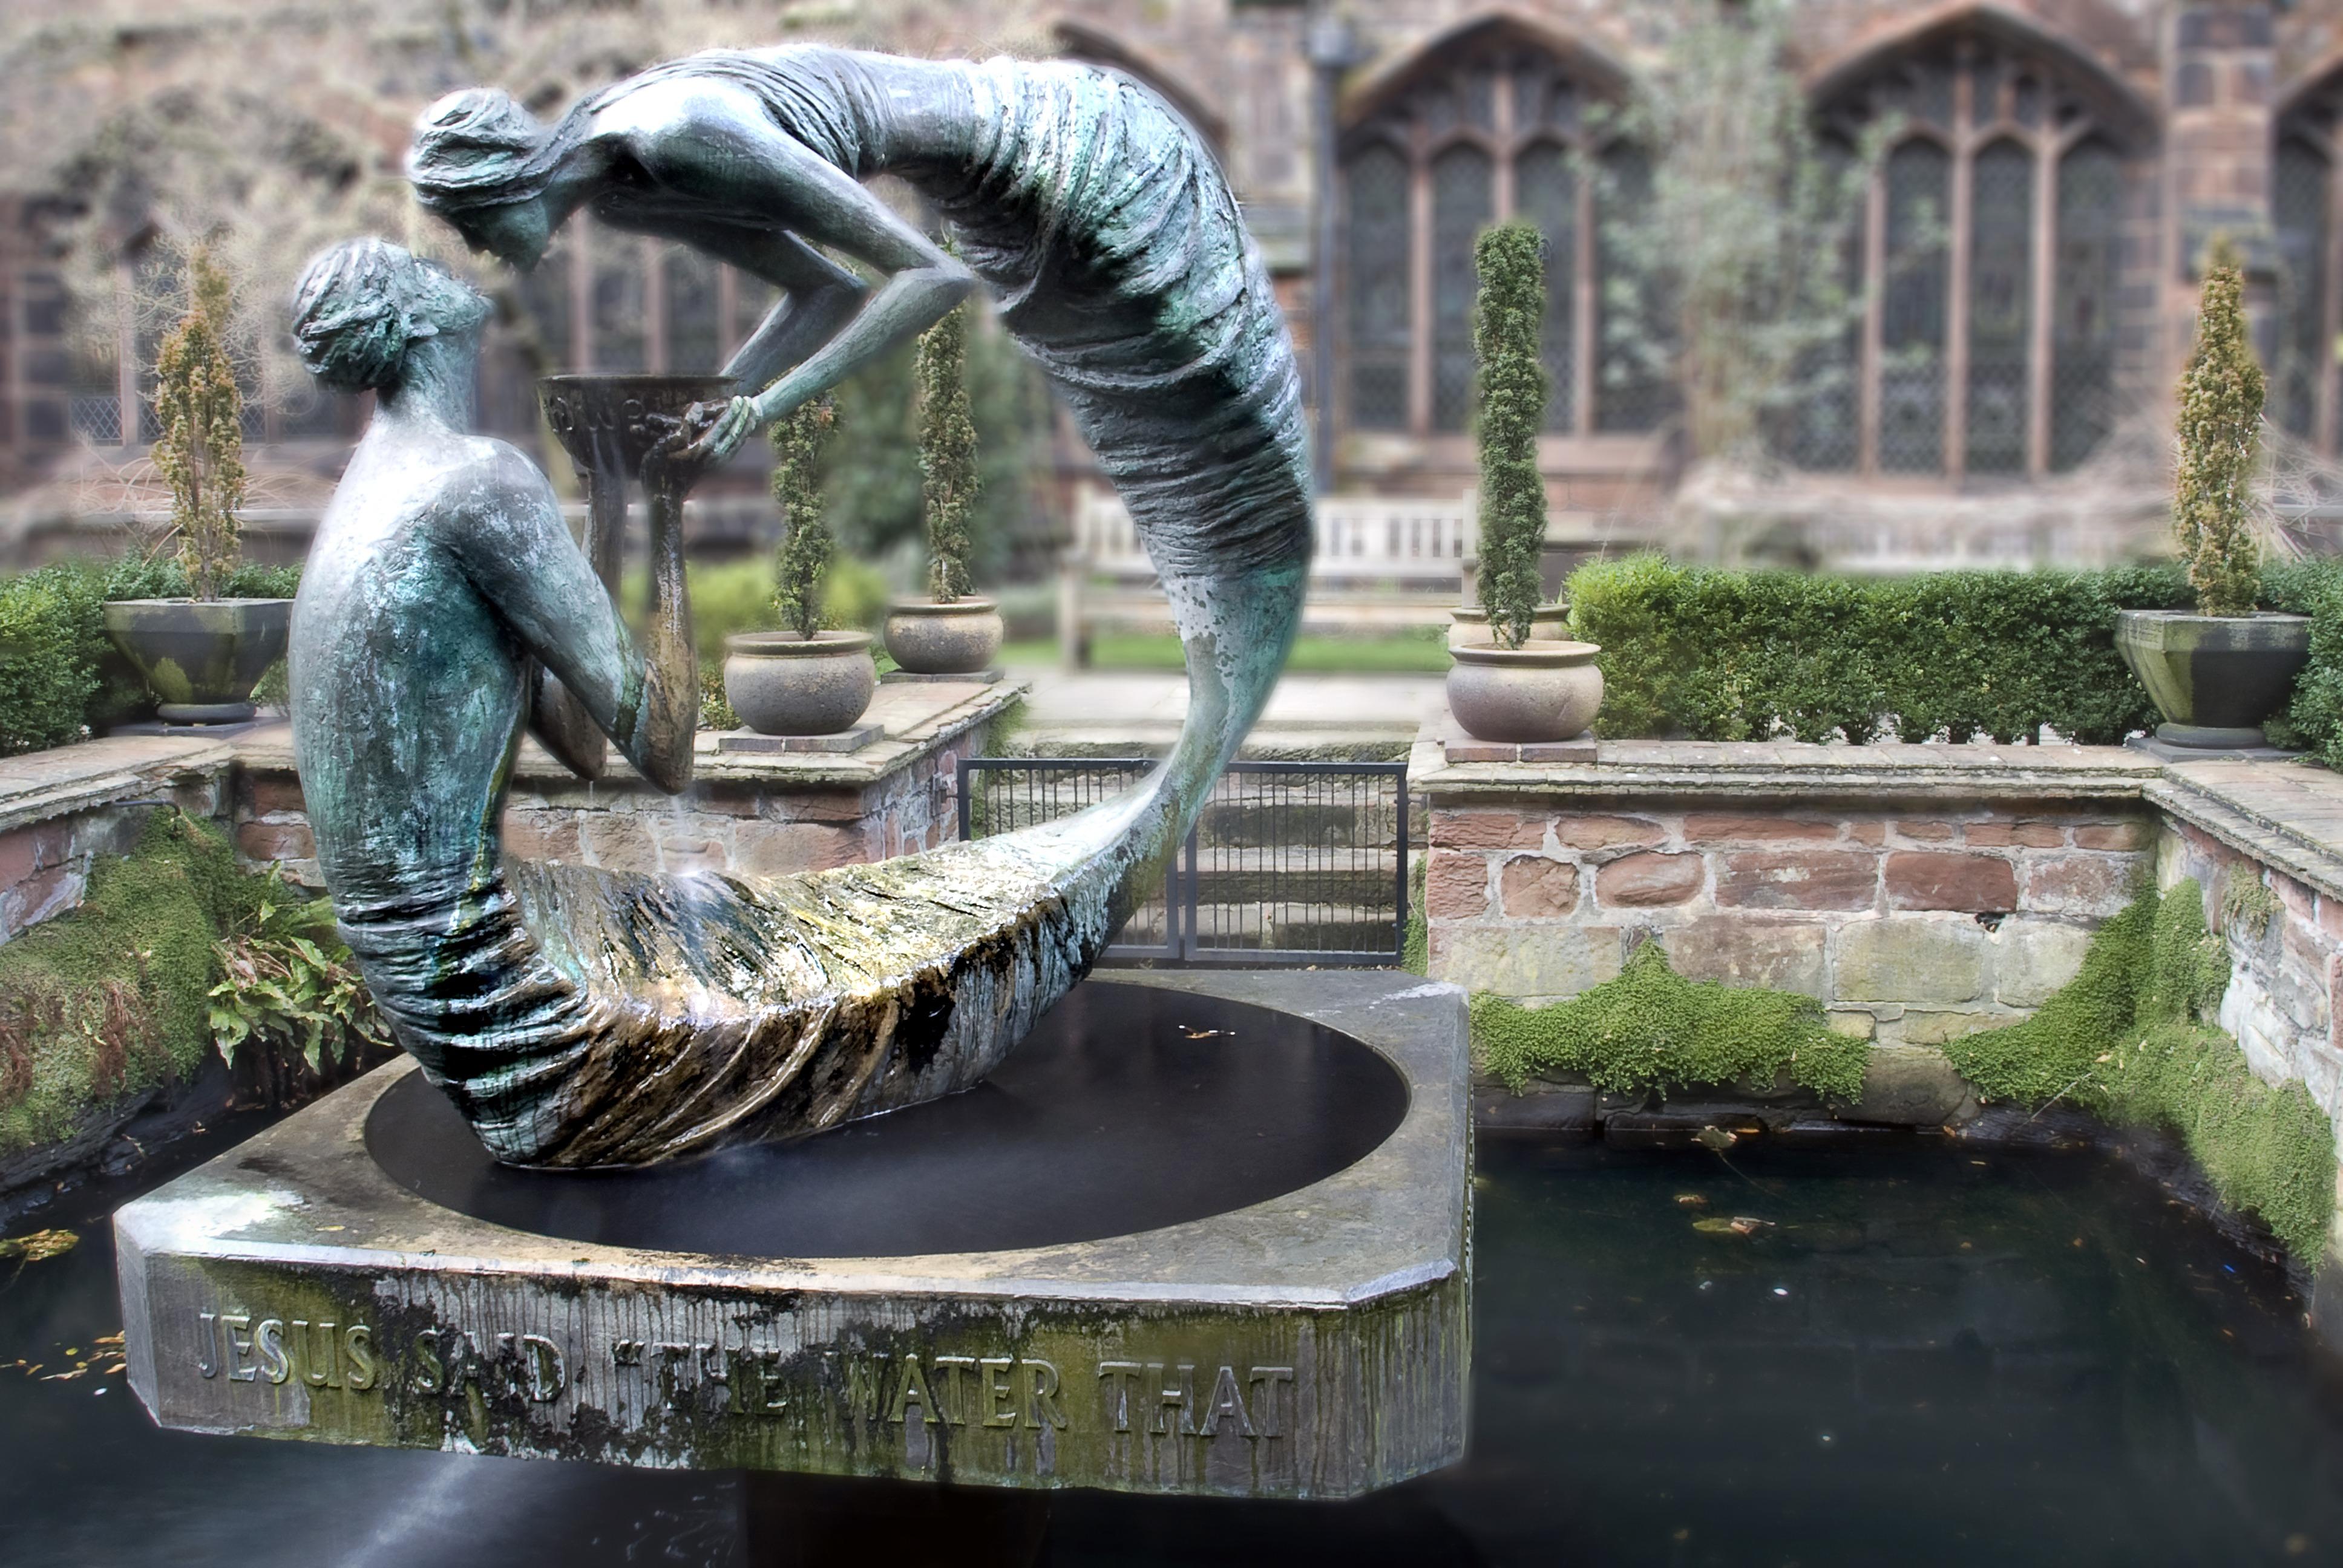 creative woman monument statue love zoo construction metal metal work garden artwork sculpture art figure creativity design fountain water feature metallic